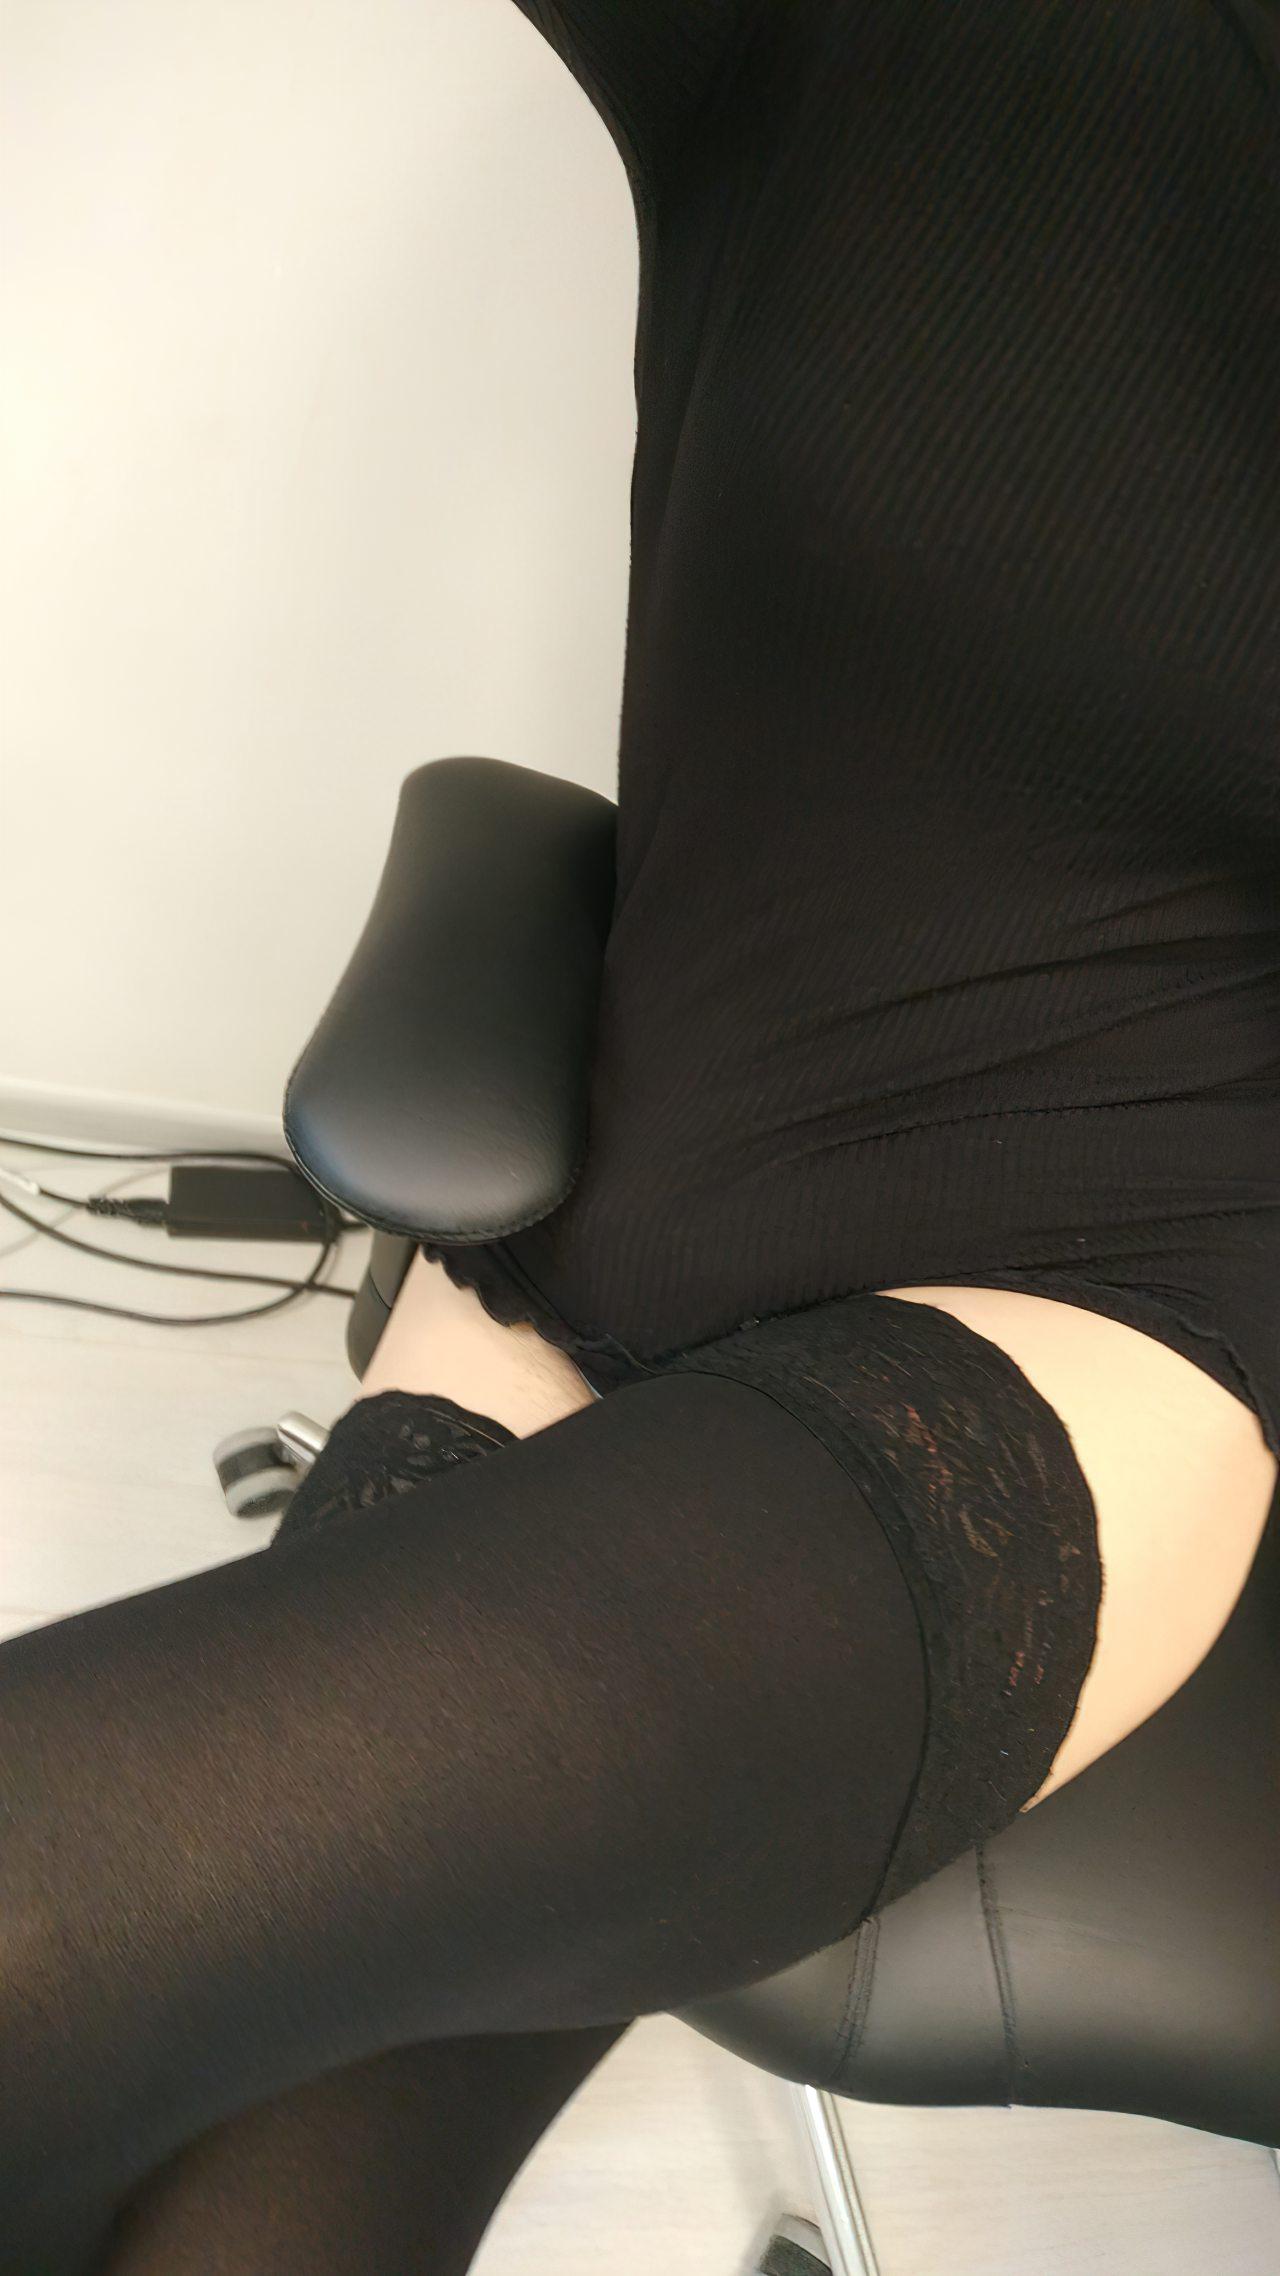 Secretaria Travesti Peluda (11)